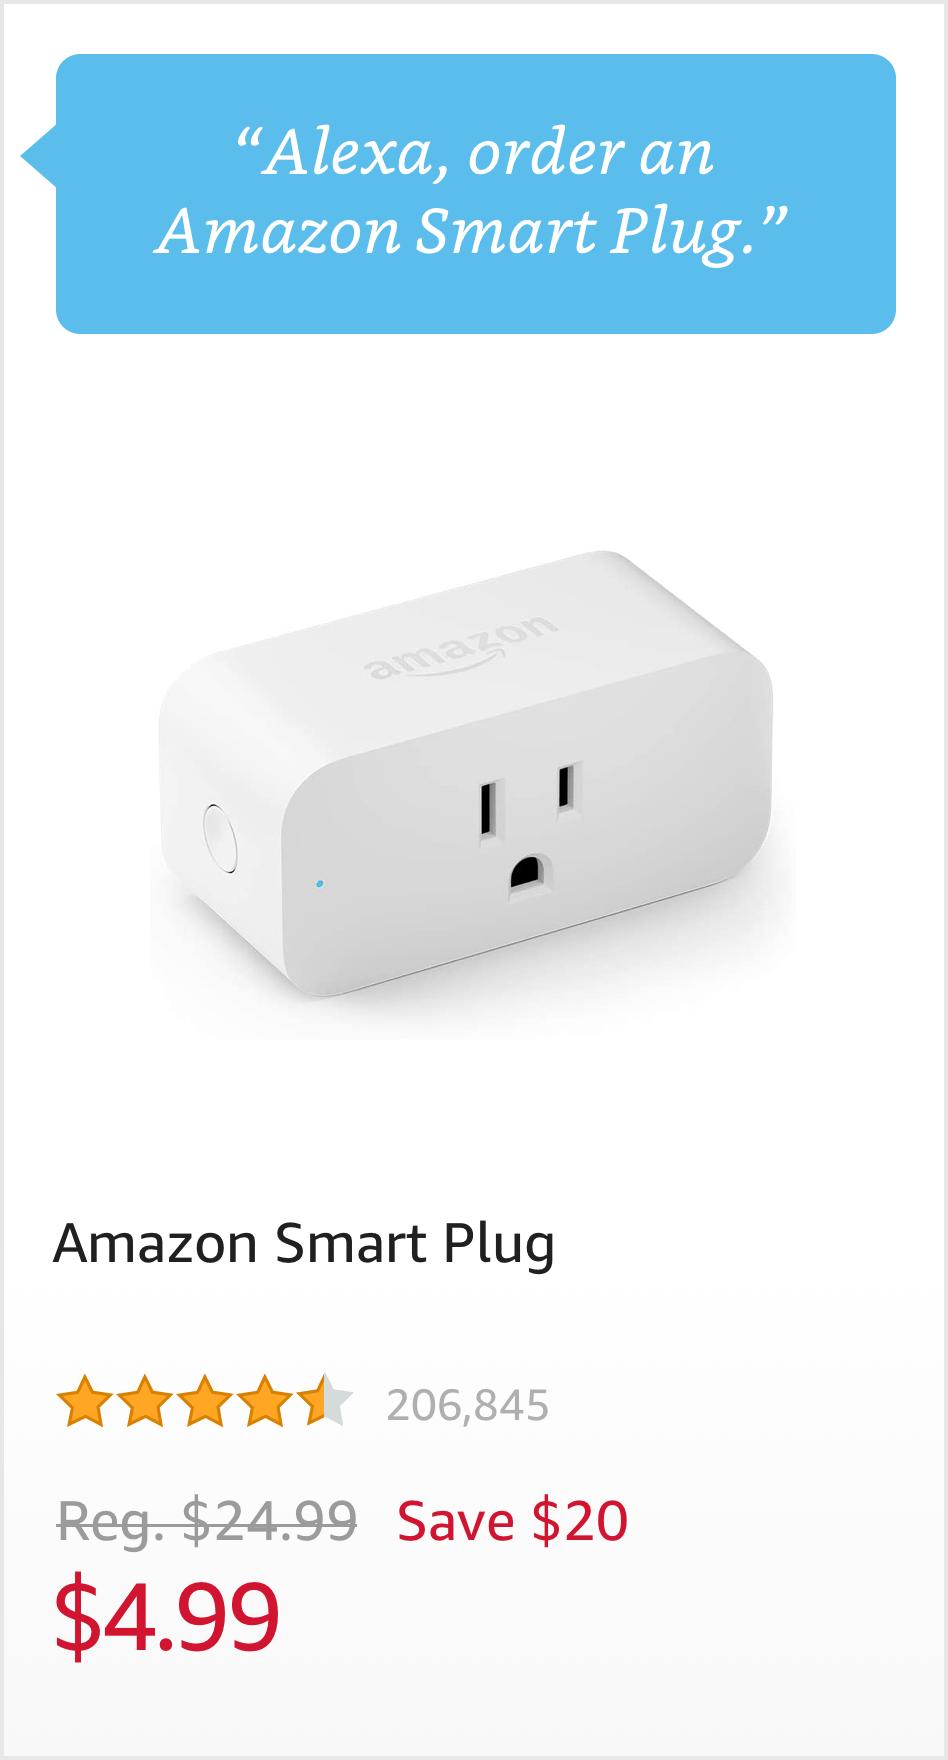 """Order an Amazon Smart Plug."" $4.99"